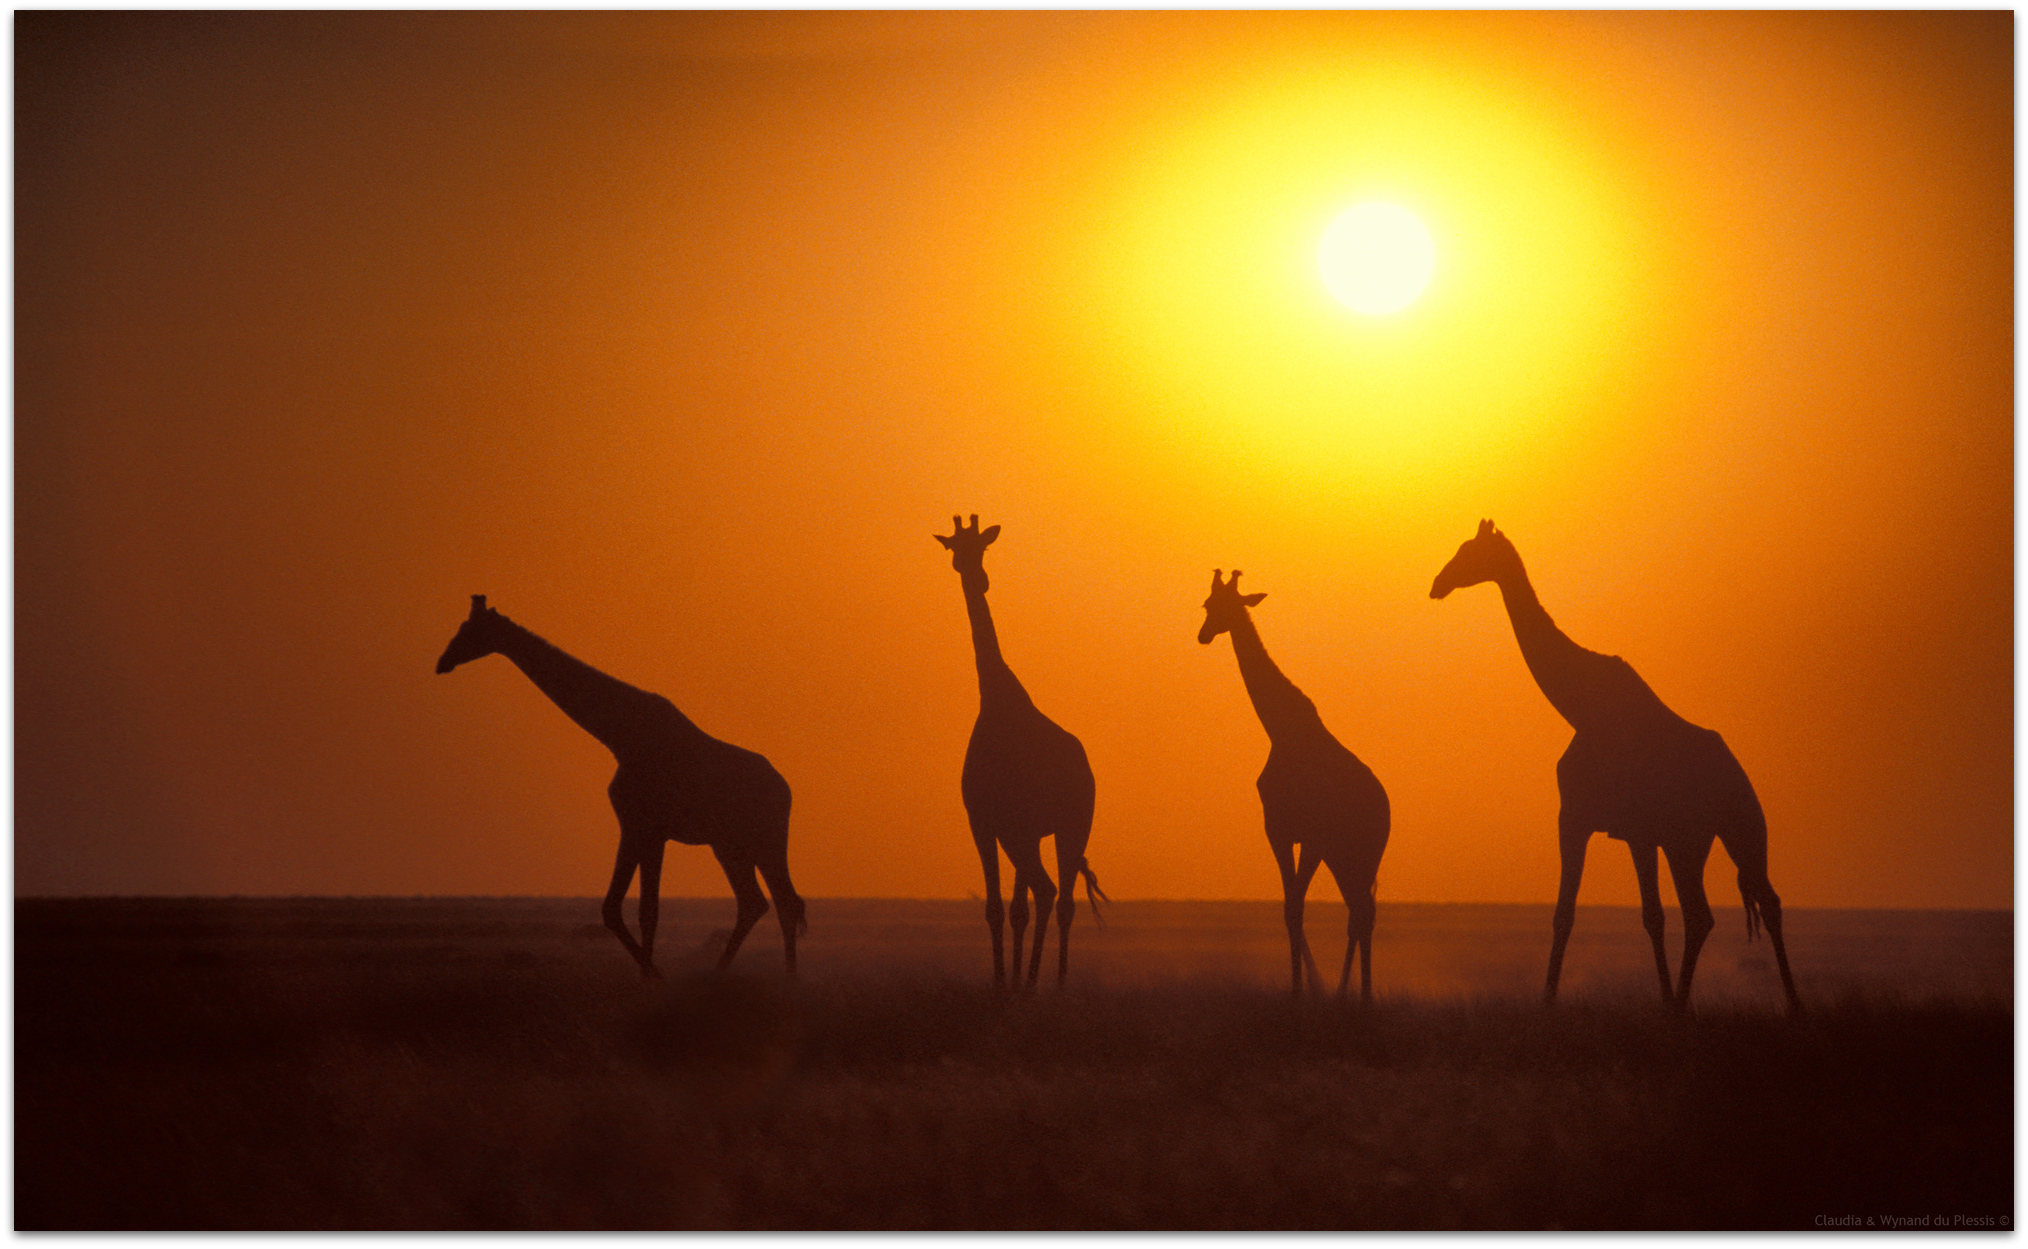 Giraffes in Okaukuejo in the Etosha National Park